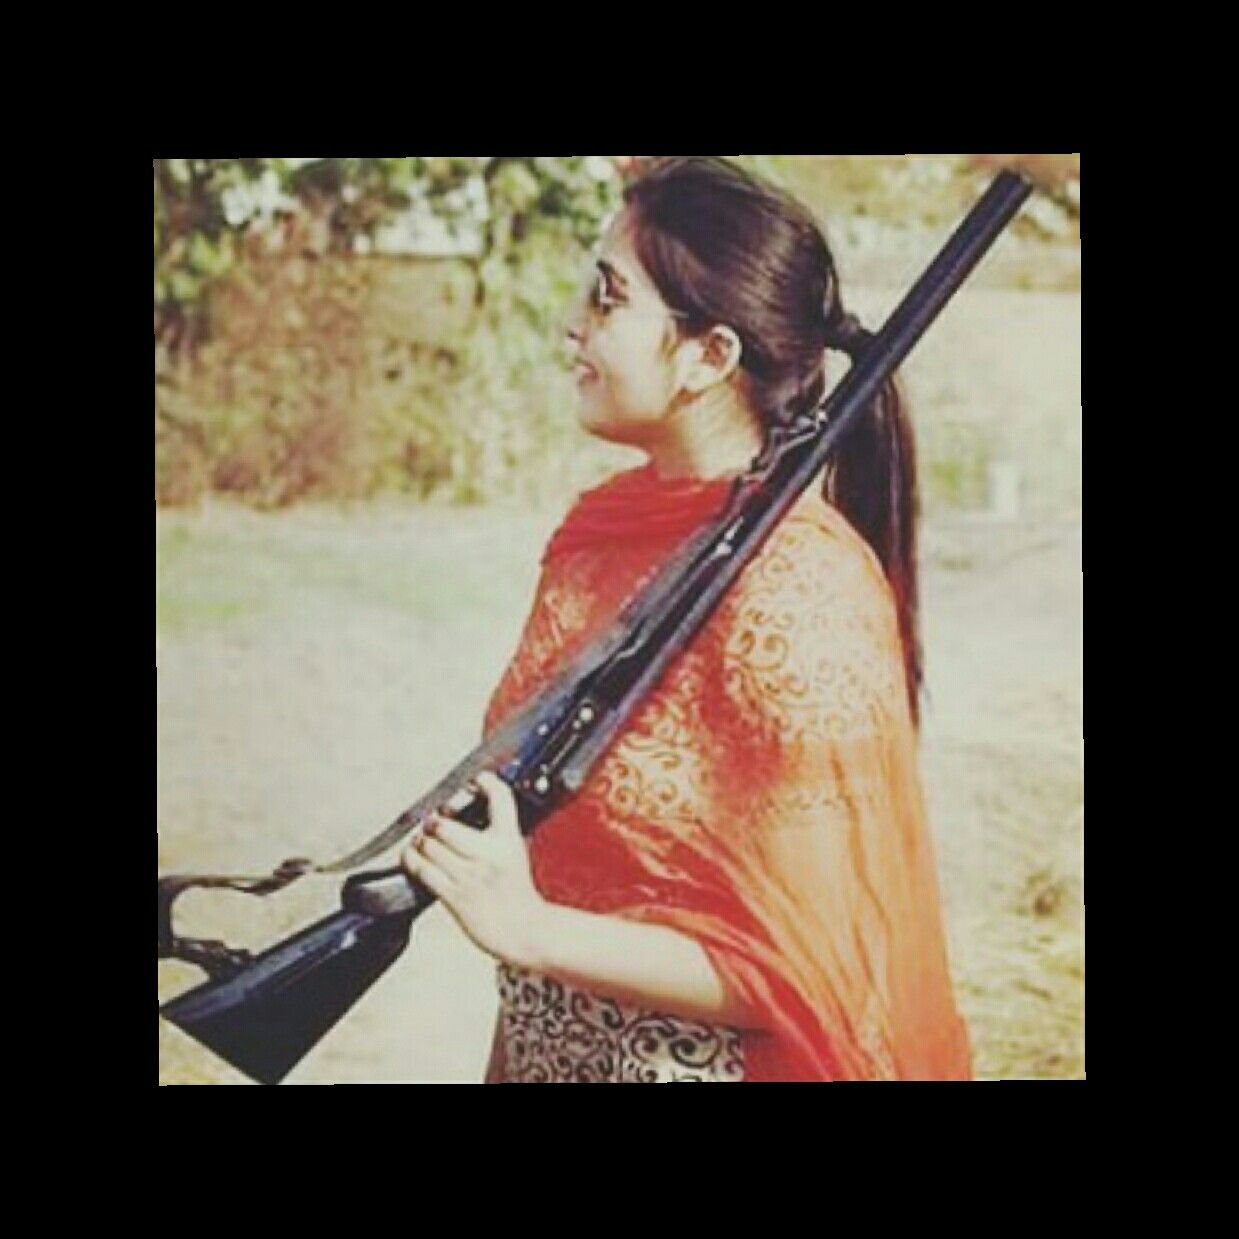 Pin by Monika Singh on Dpzzz Girly pictures, Girl guns